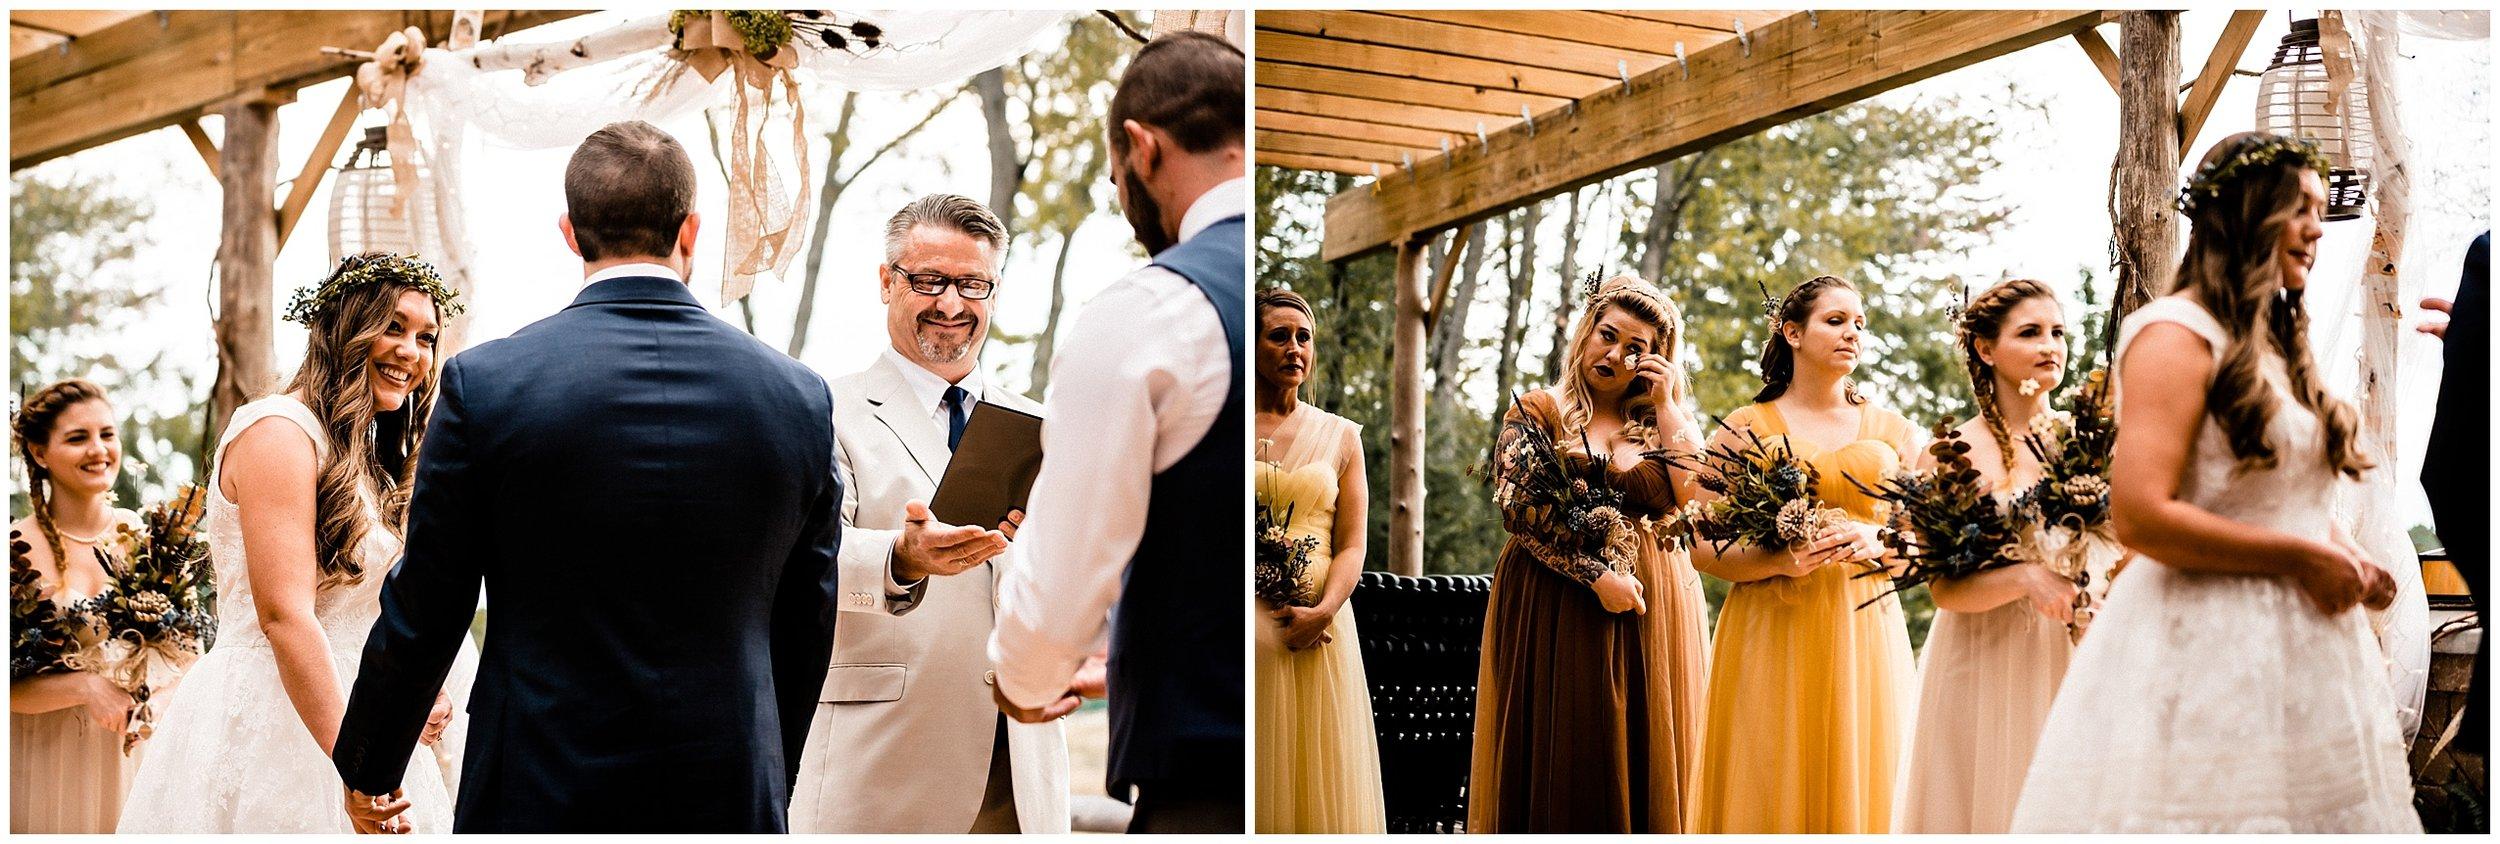 Jerod + Ashley | Just Married #kyleepaigephotography_1806.jpg